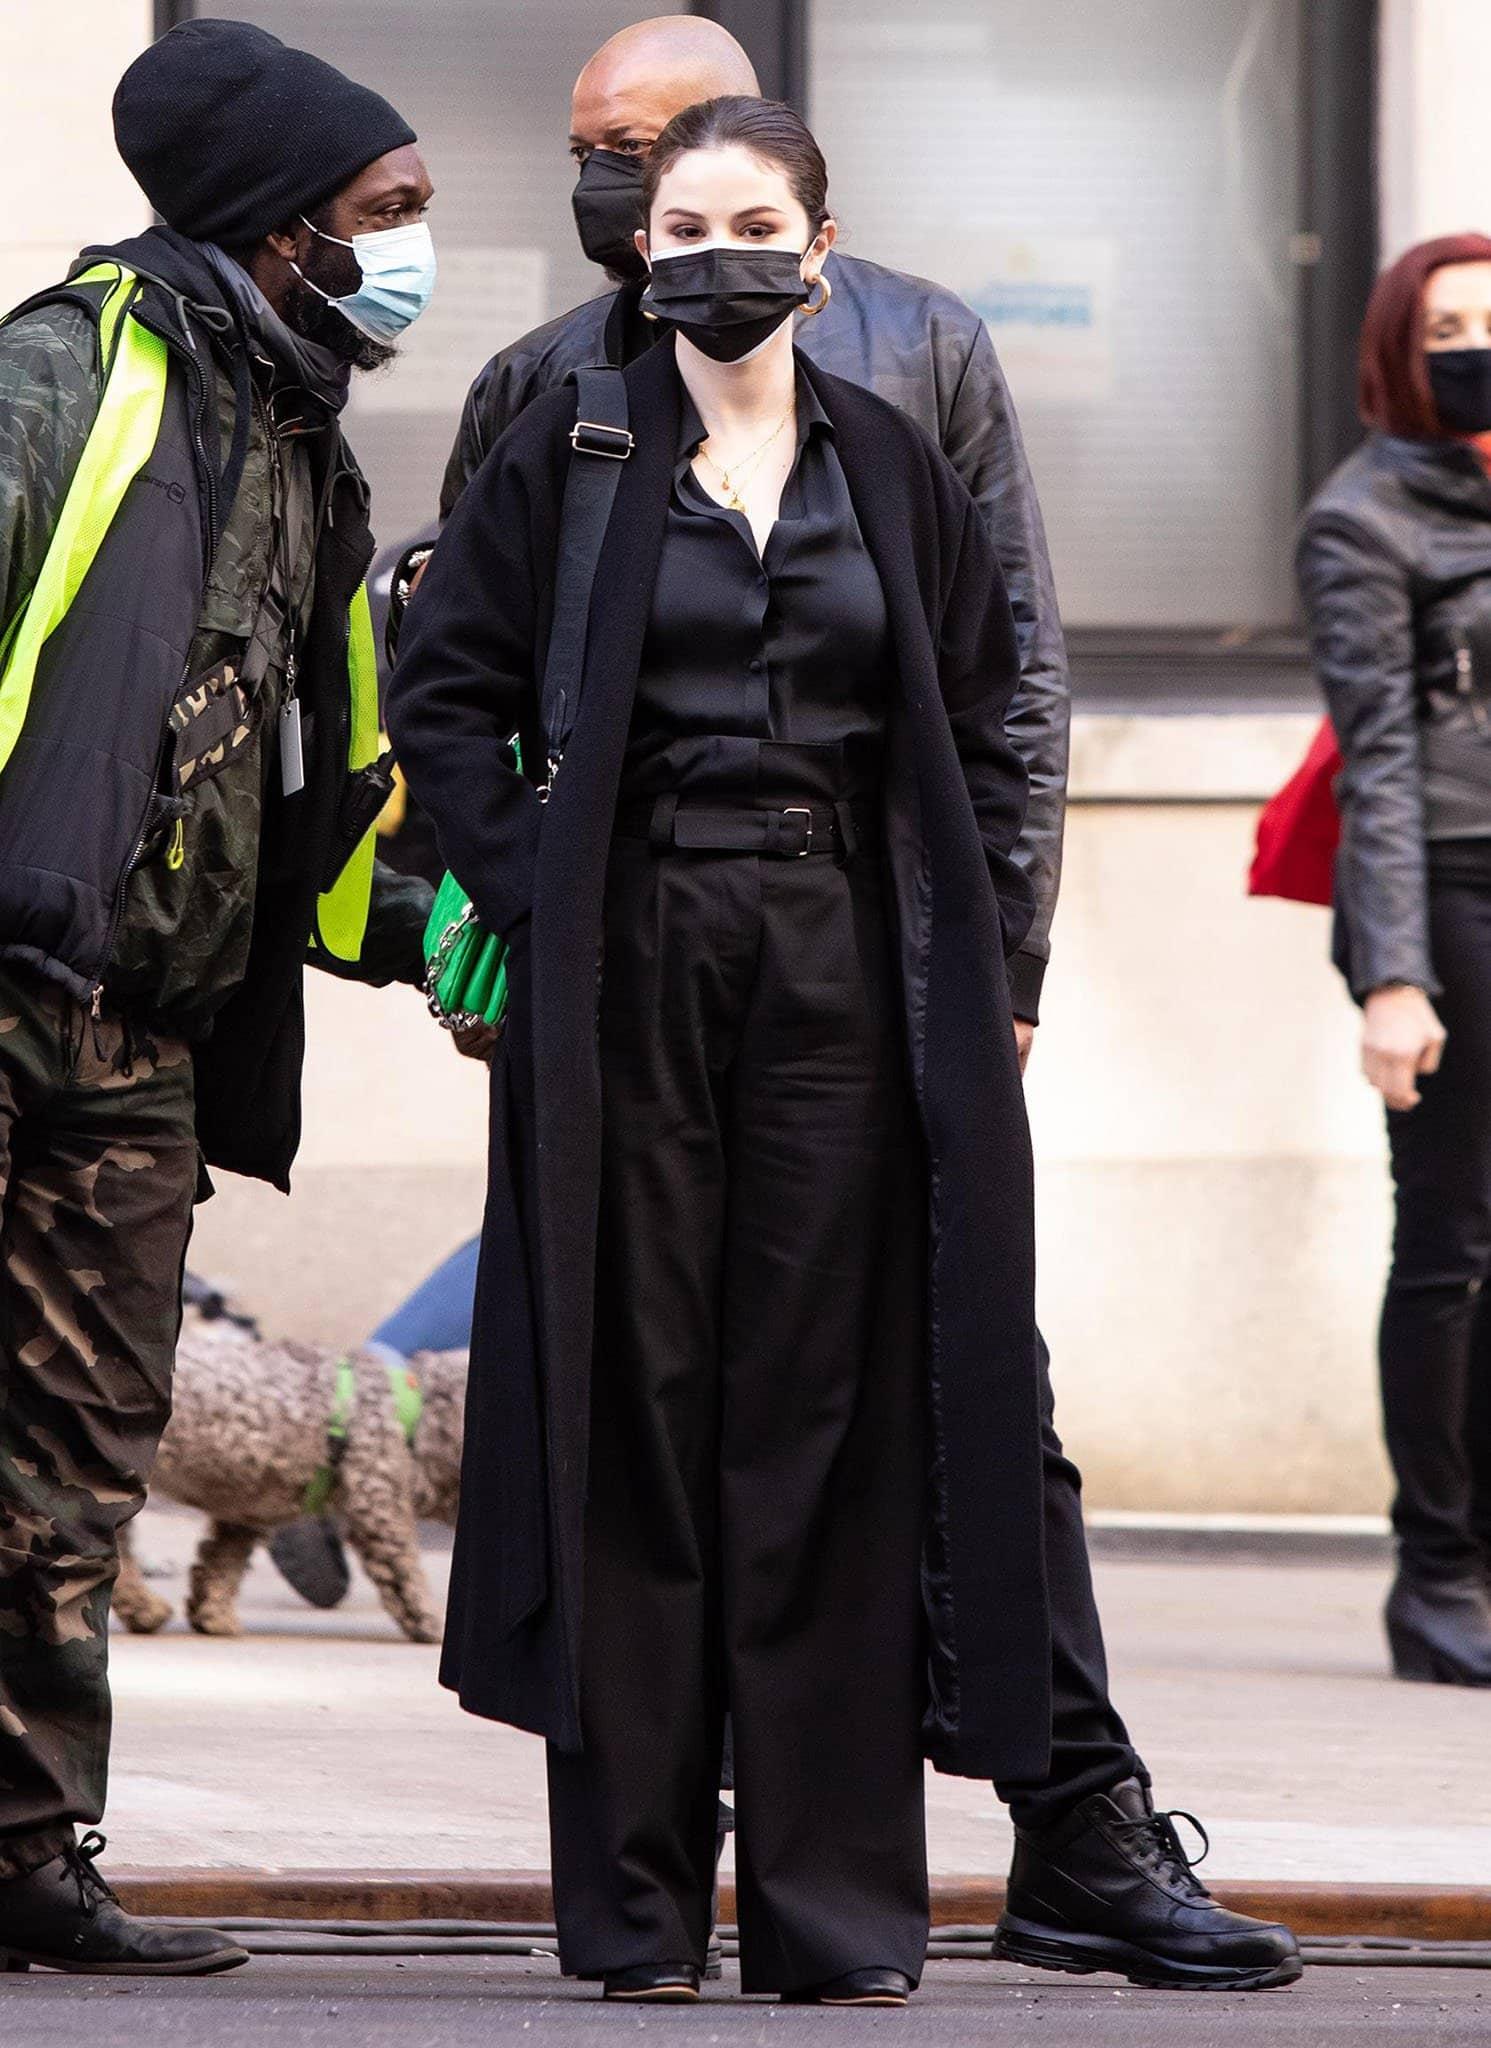 Selena Gomez carries a green Louis Vuitton Coussin PM crossbody bag